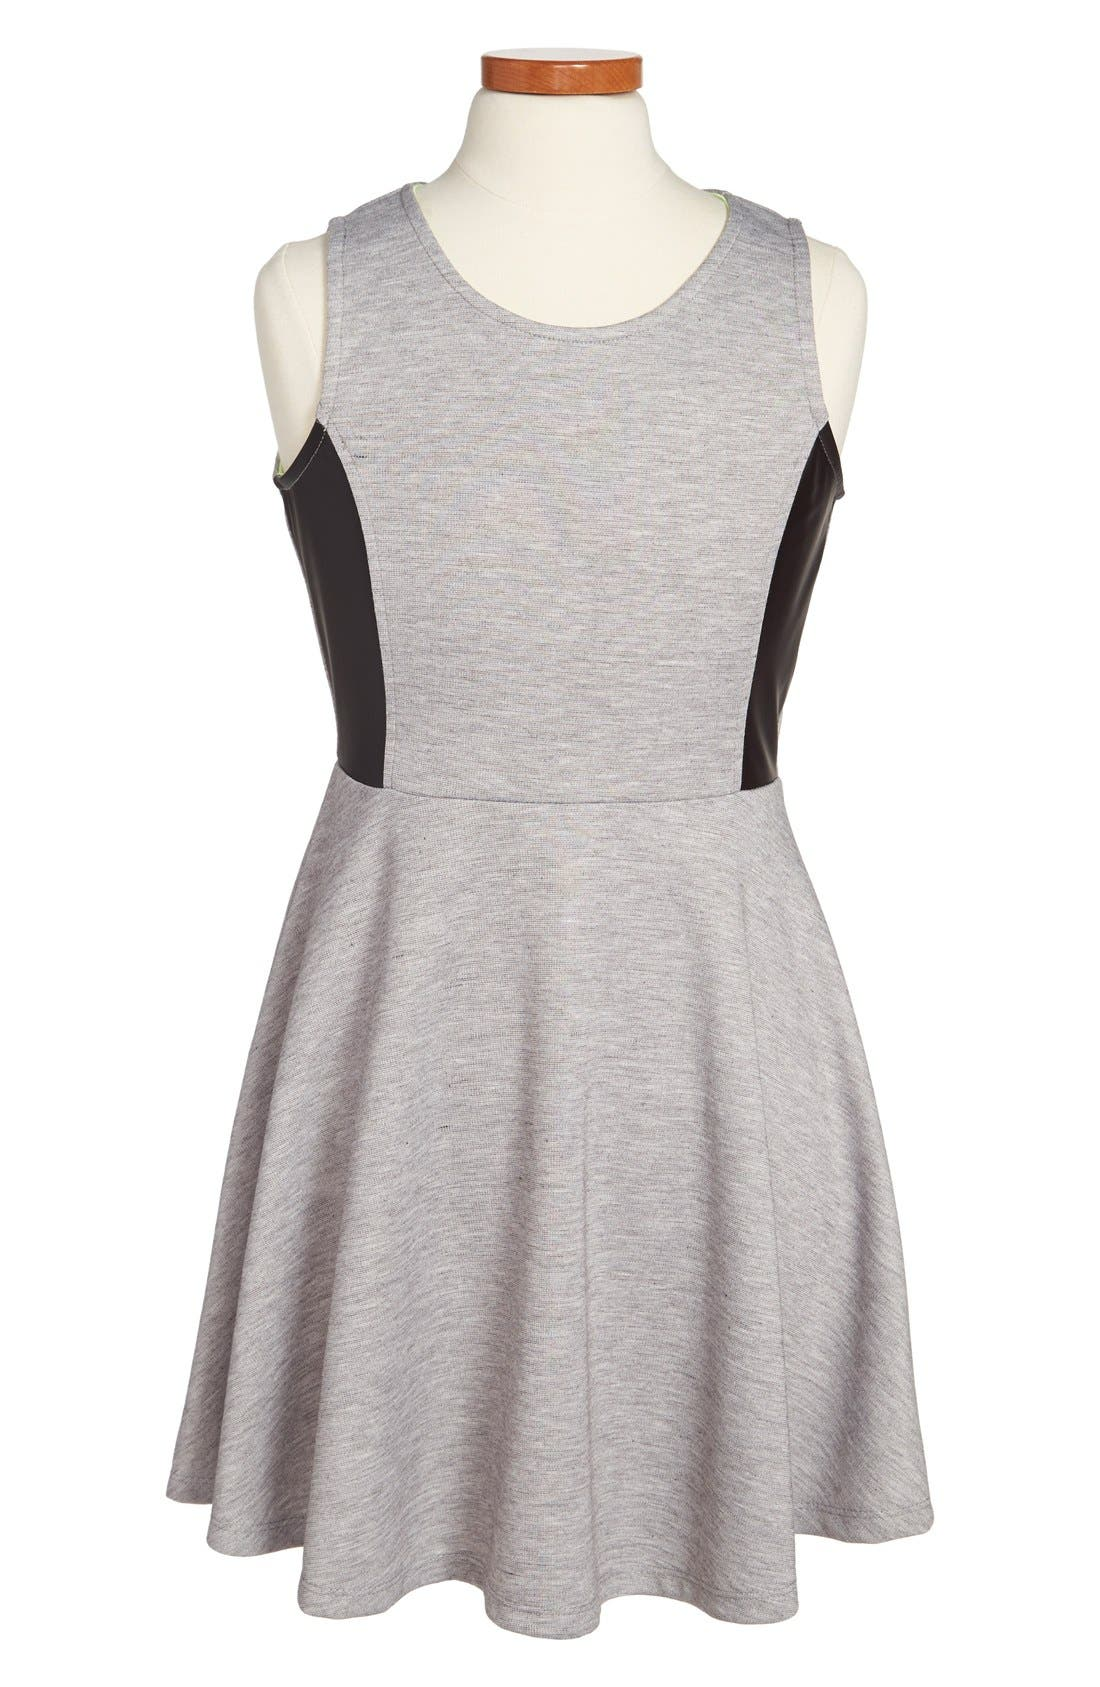 Main Image - W Girl Sleeveless Skater Dress (Big Girls)